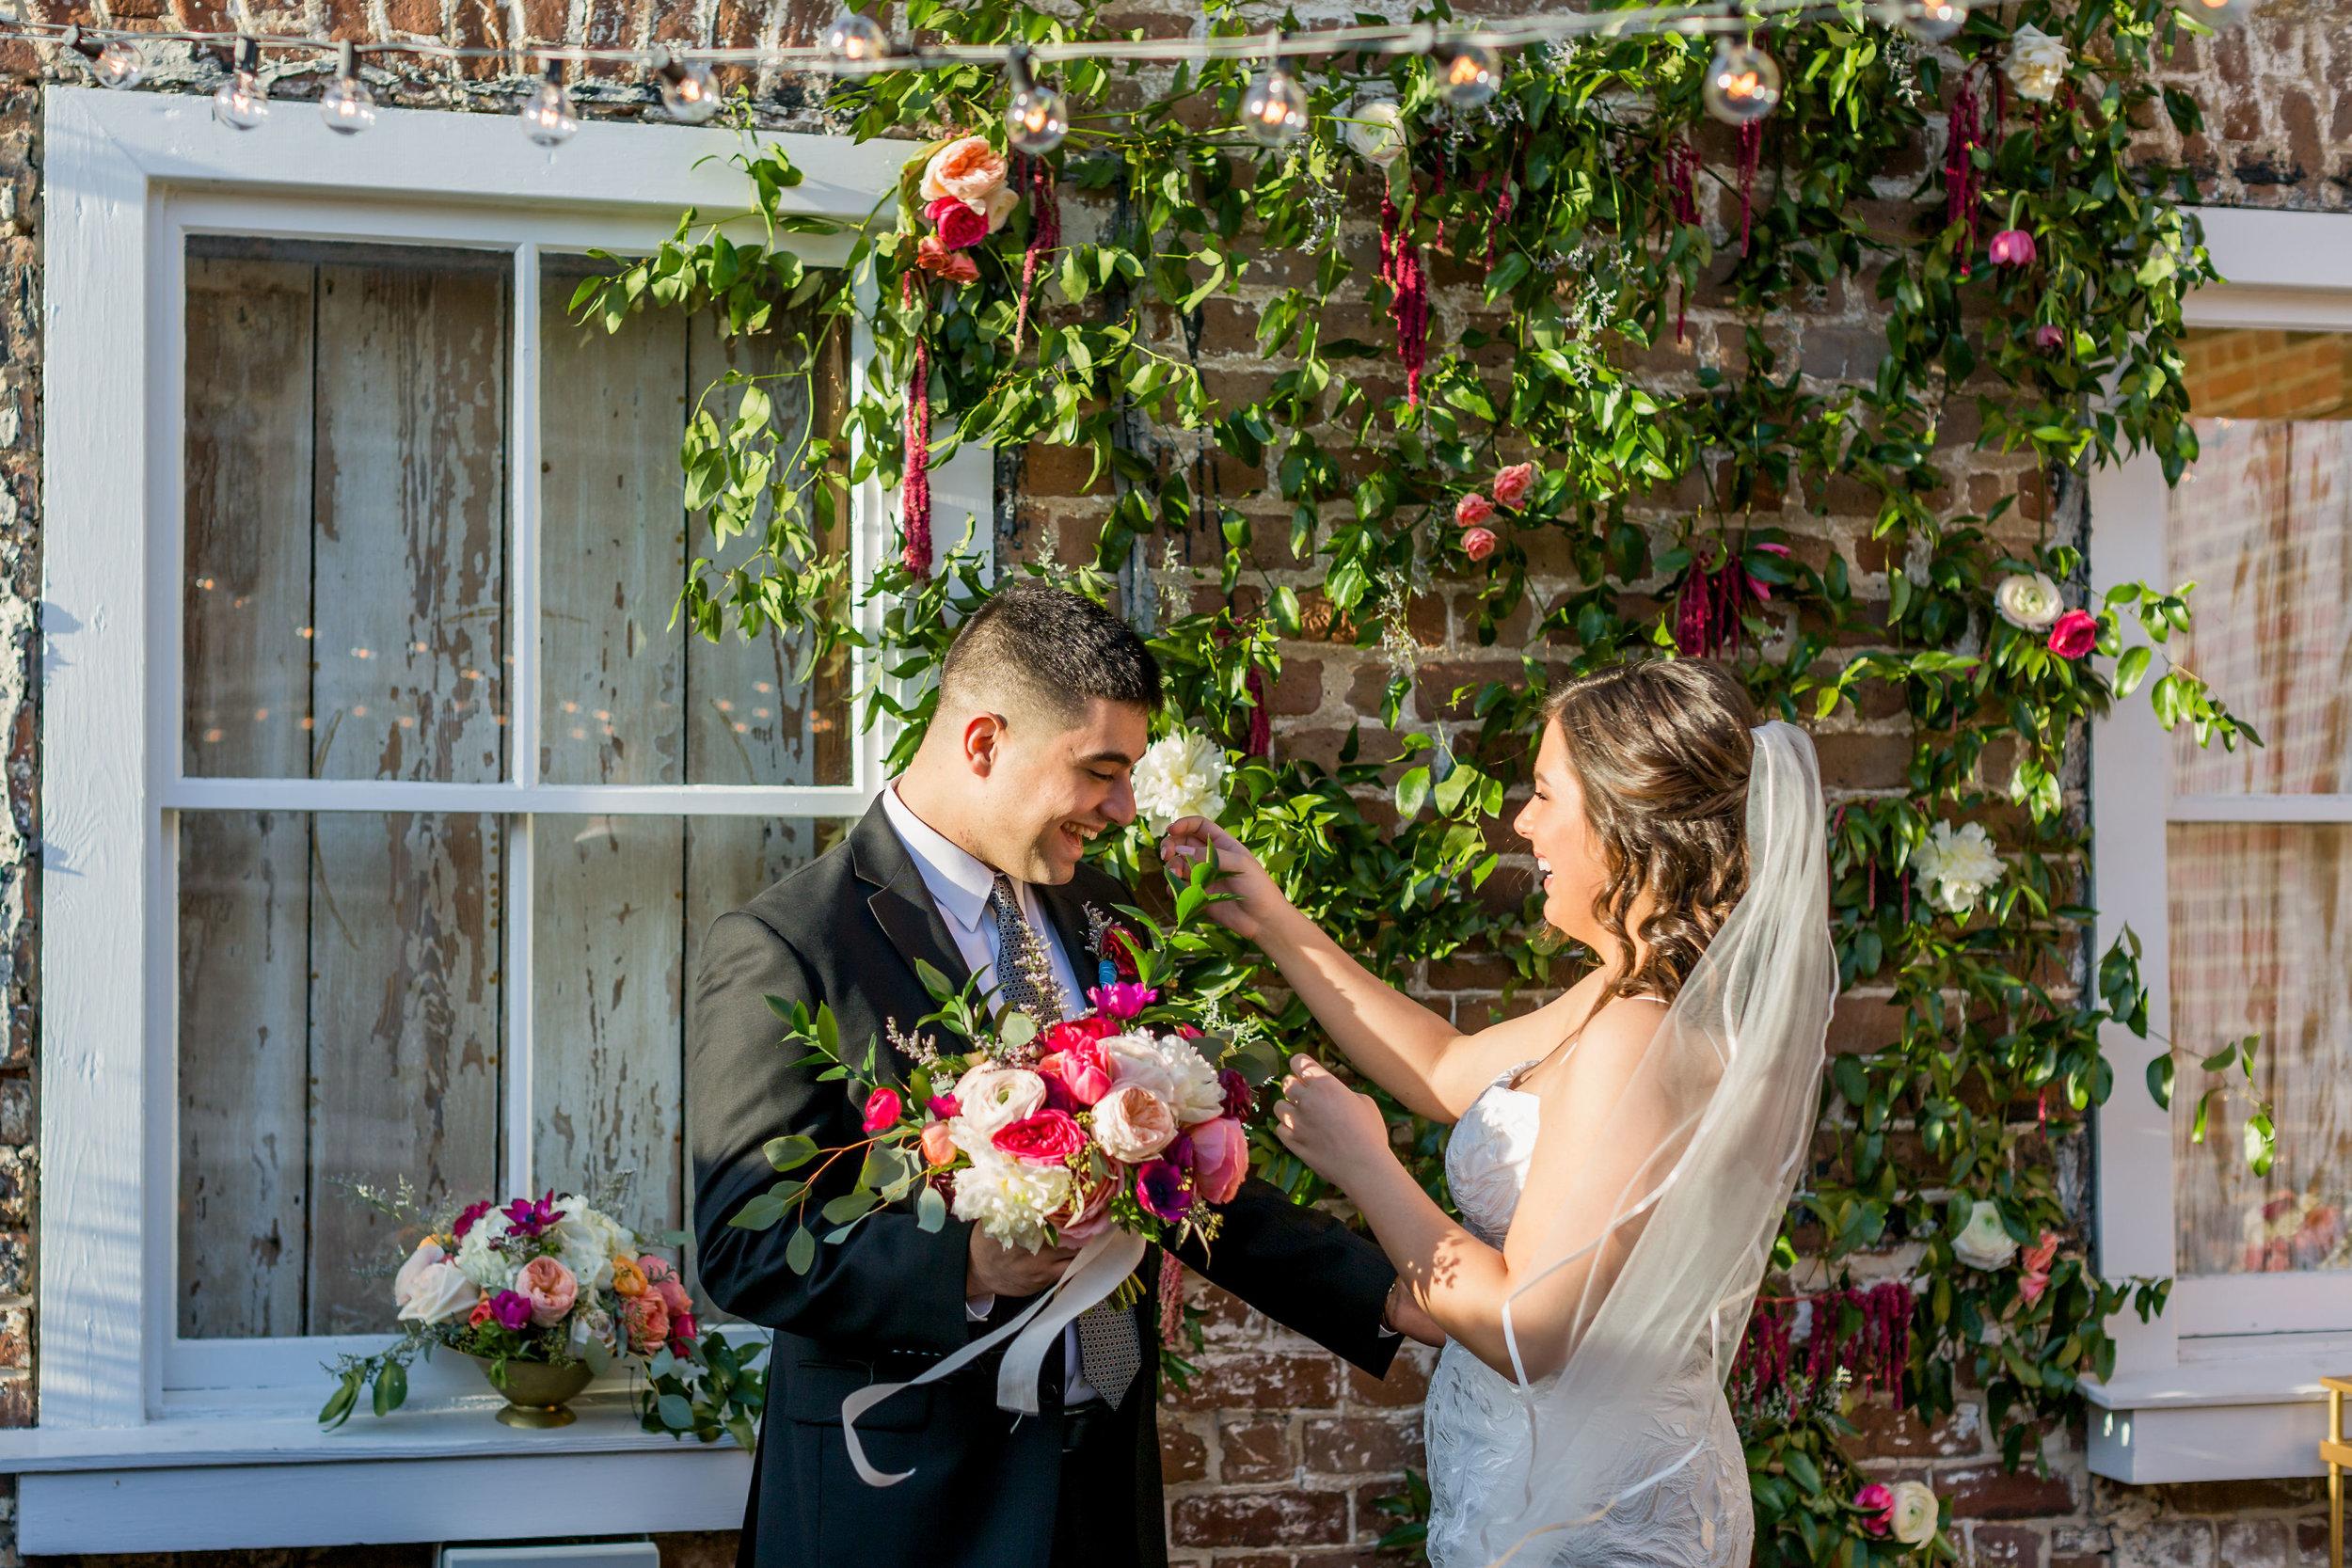 charleston new years elopement popup surprise wedding at upstairs at midtown - scarlet plan & design wedding planners (319).jpg